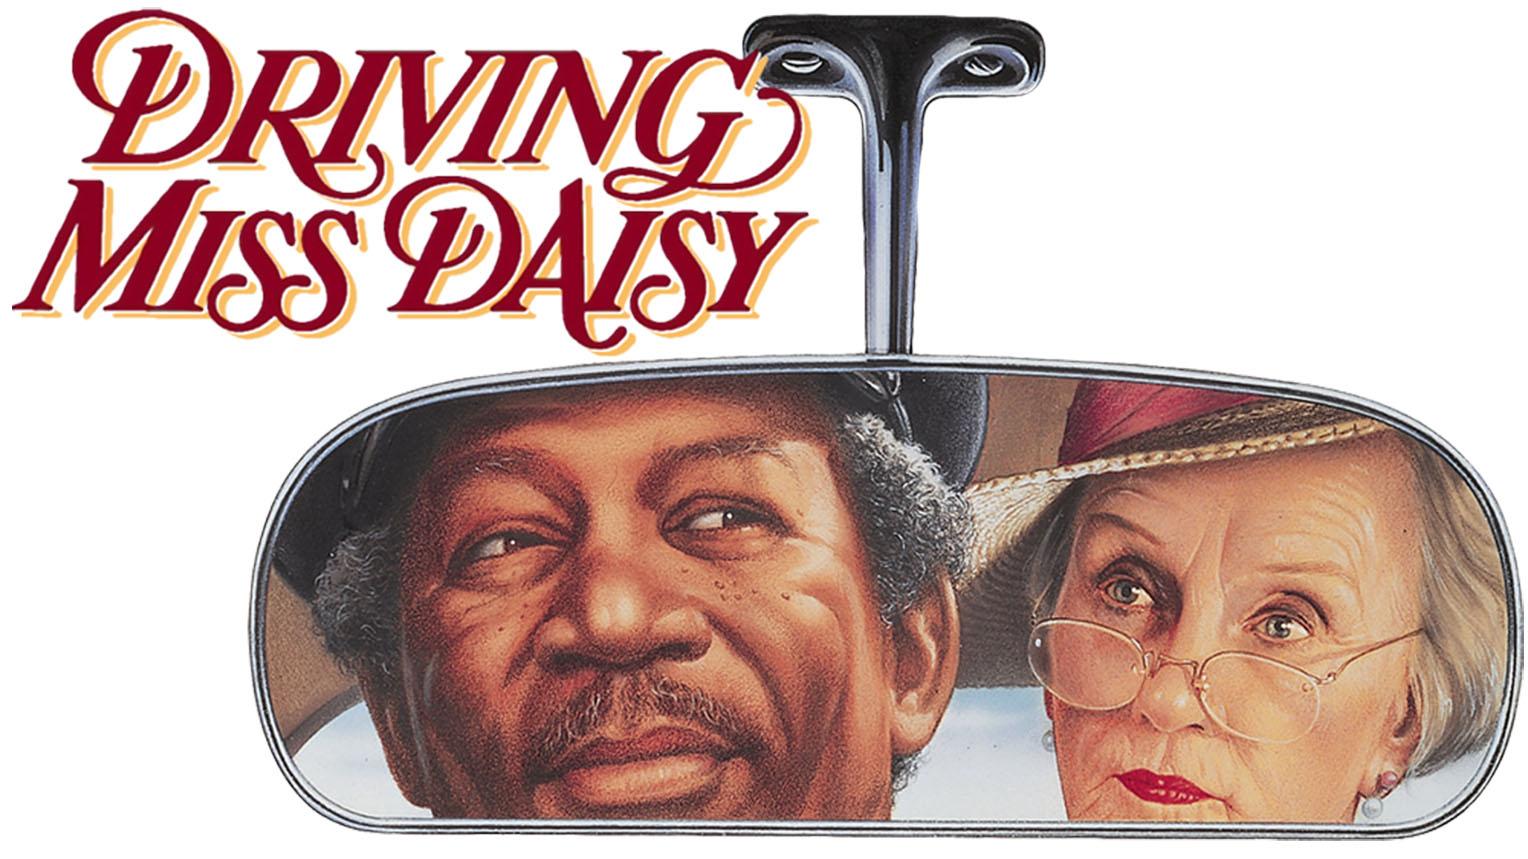 Bayan Daisy ve şoförü (Driving Miss Daisy)